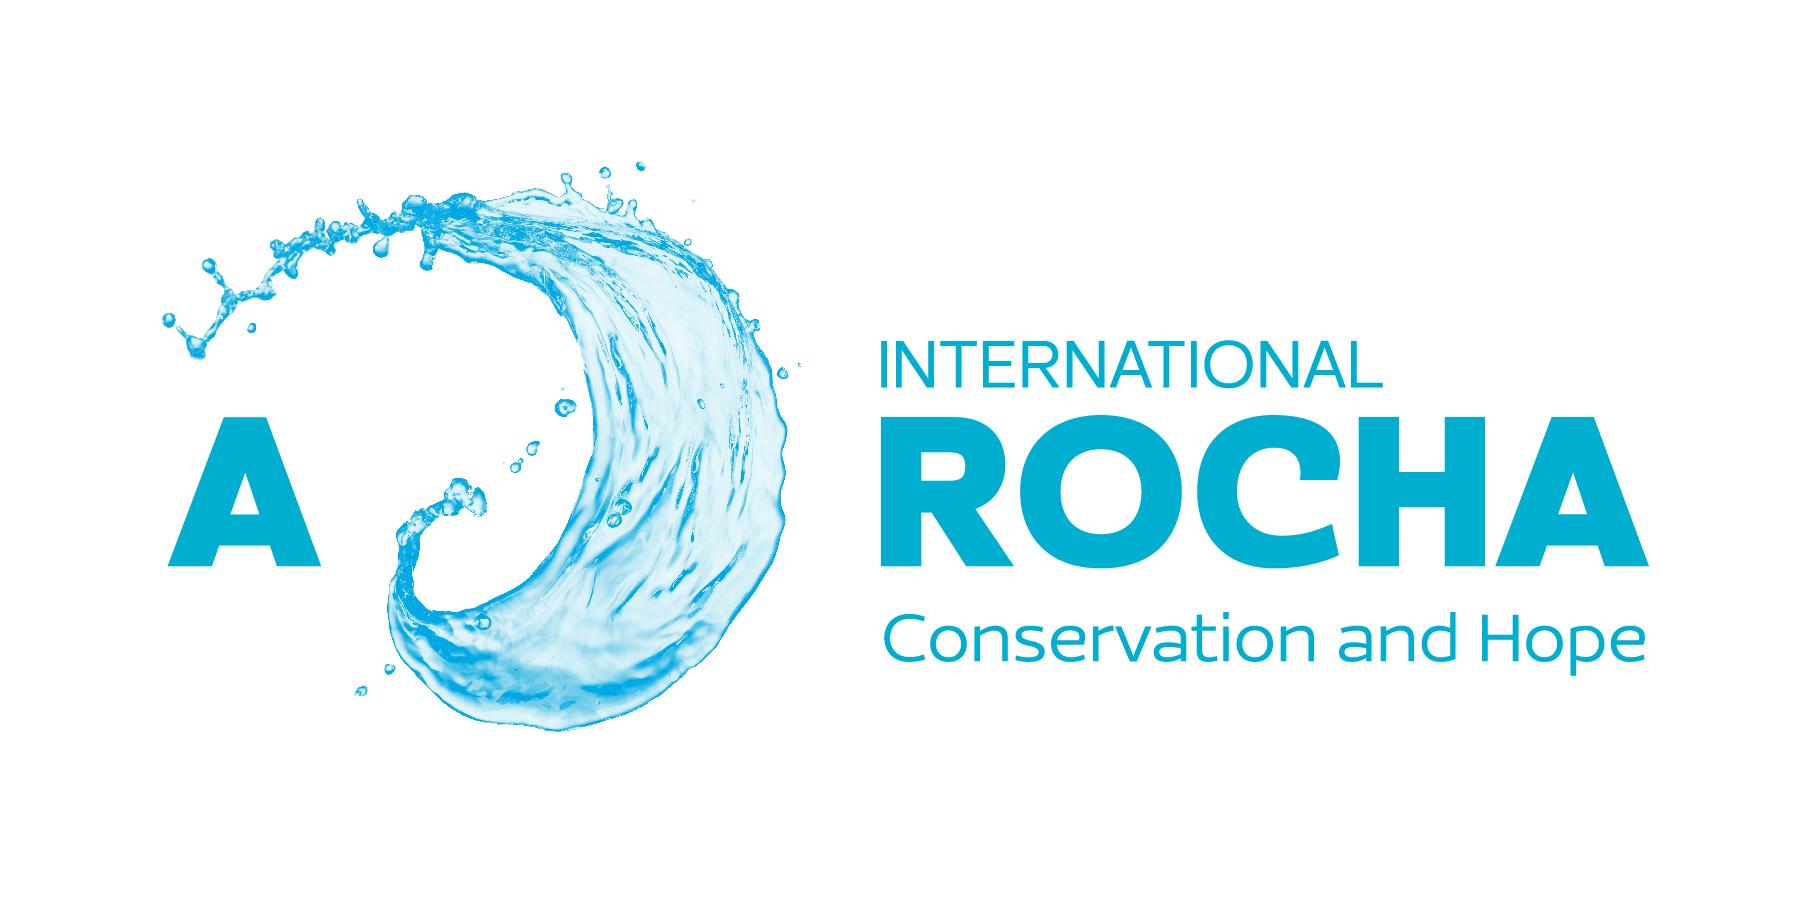 SDG 14 - A Rocha wave logo blue.jpg